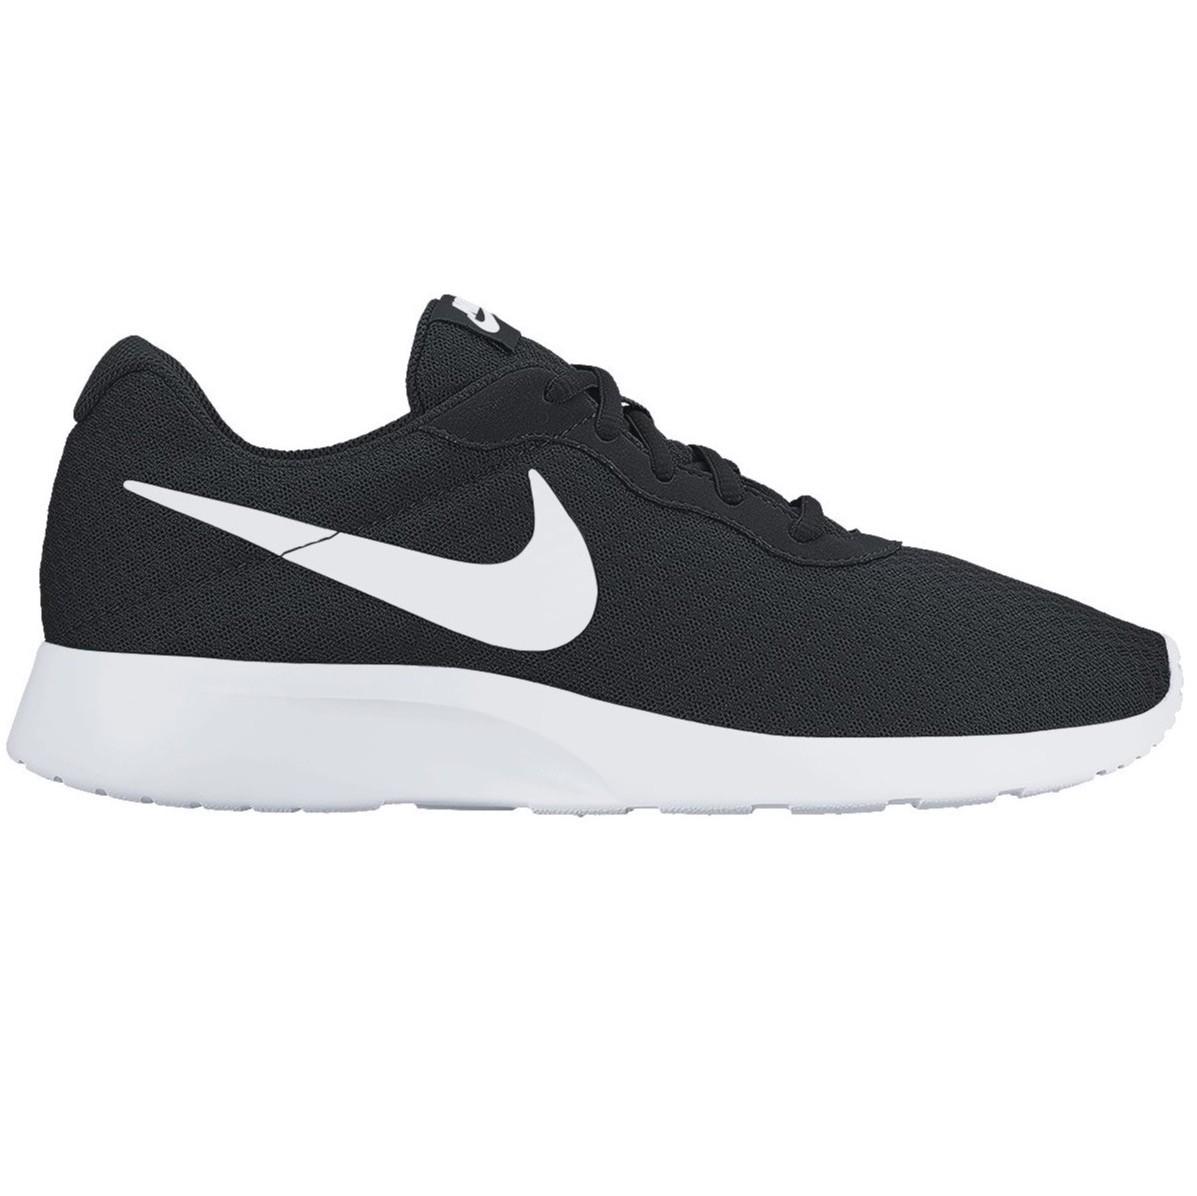 15a53cac7389e Pánské tenisky Nike TANJUN | D-Sport